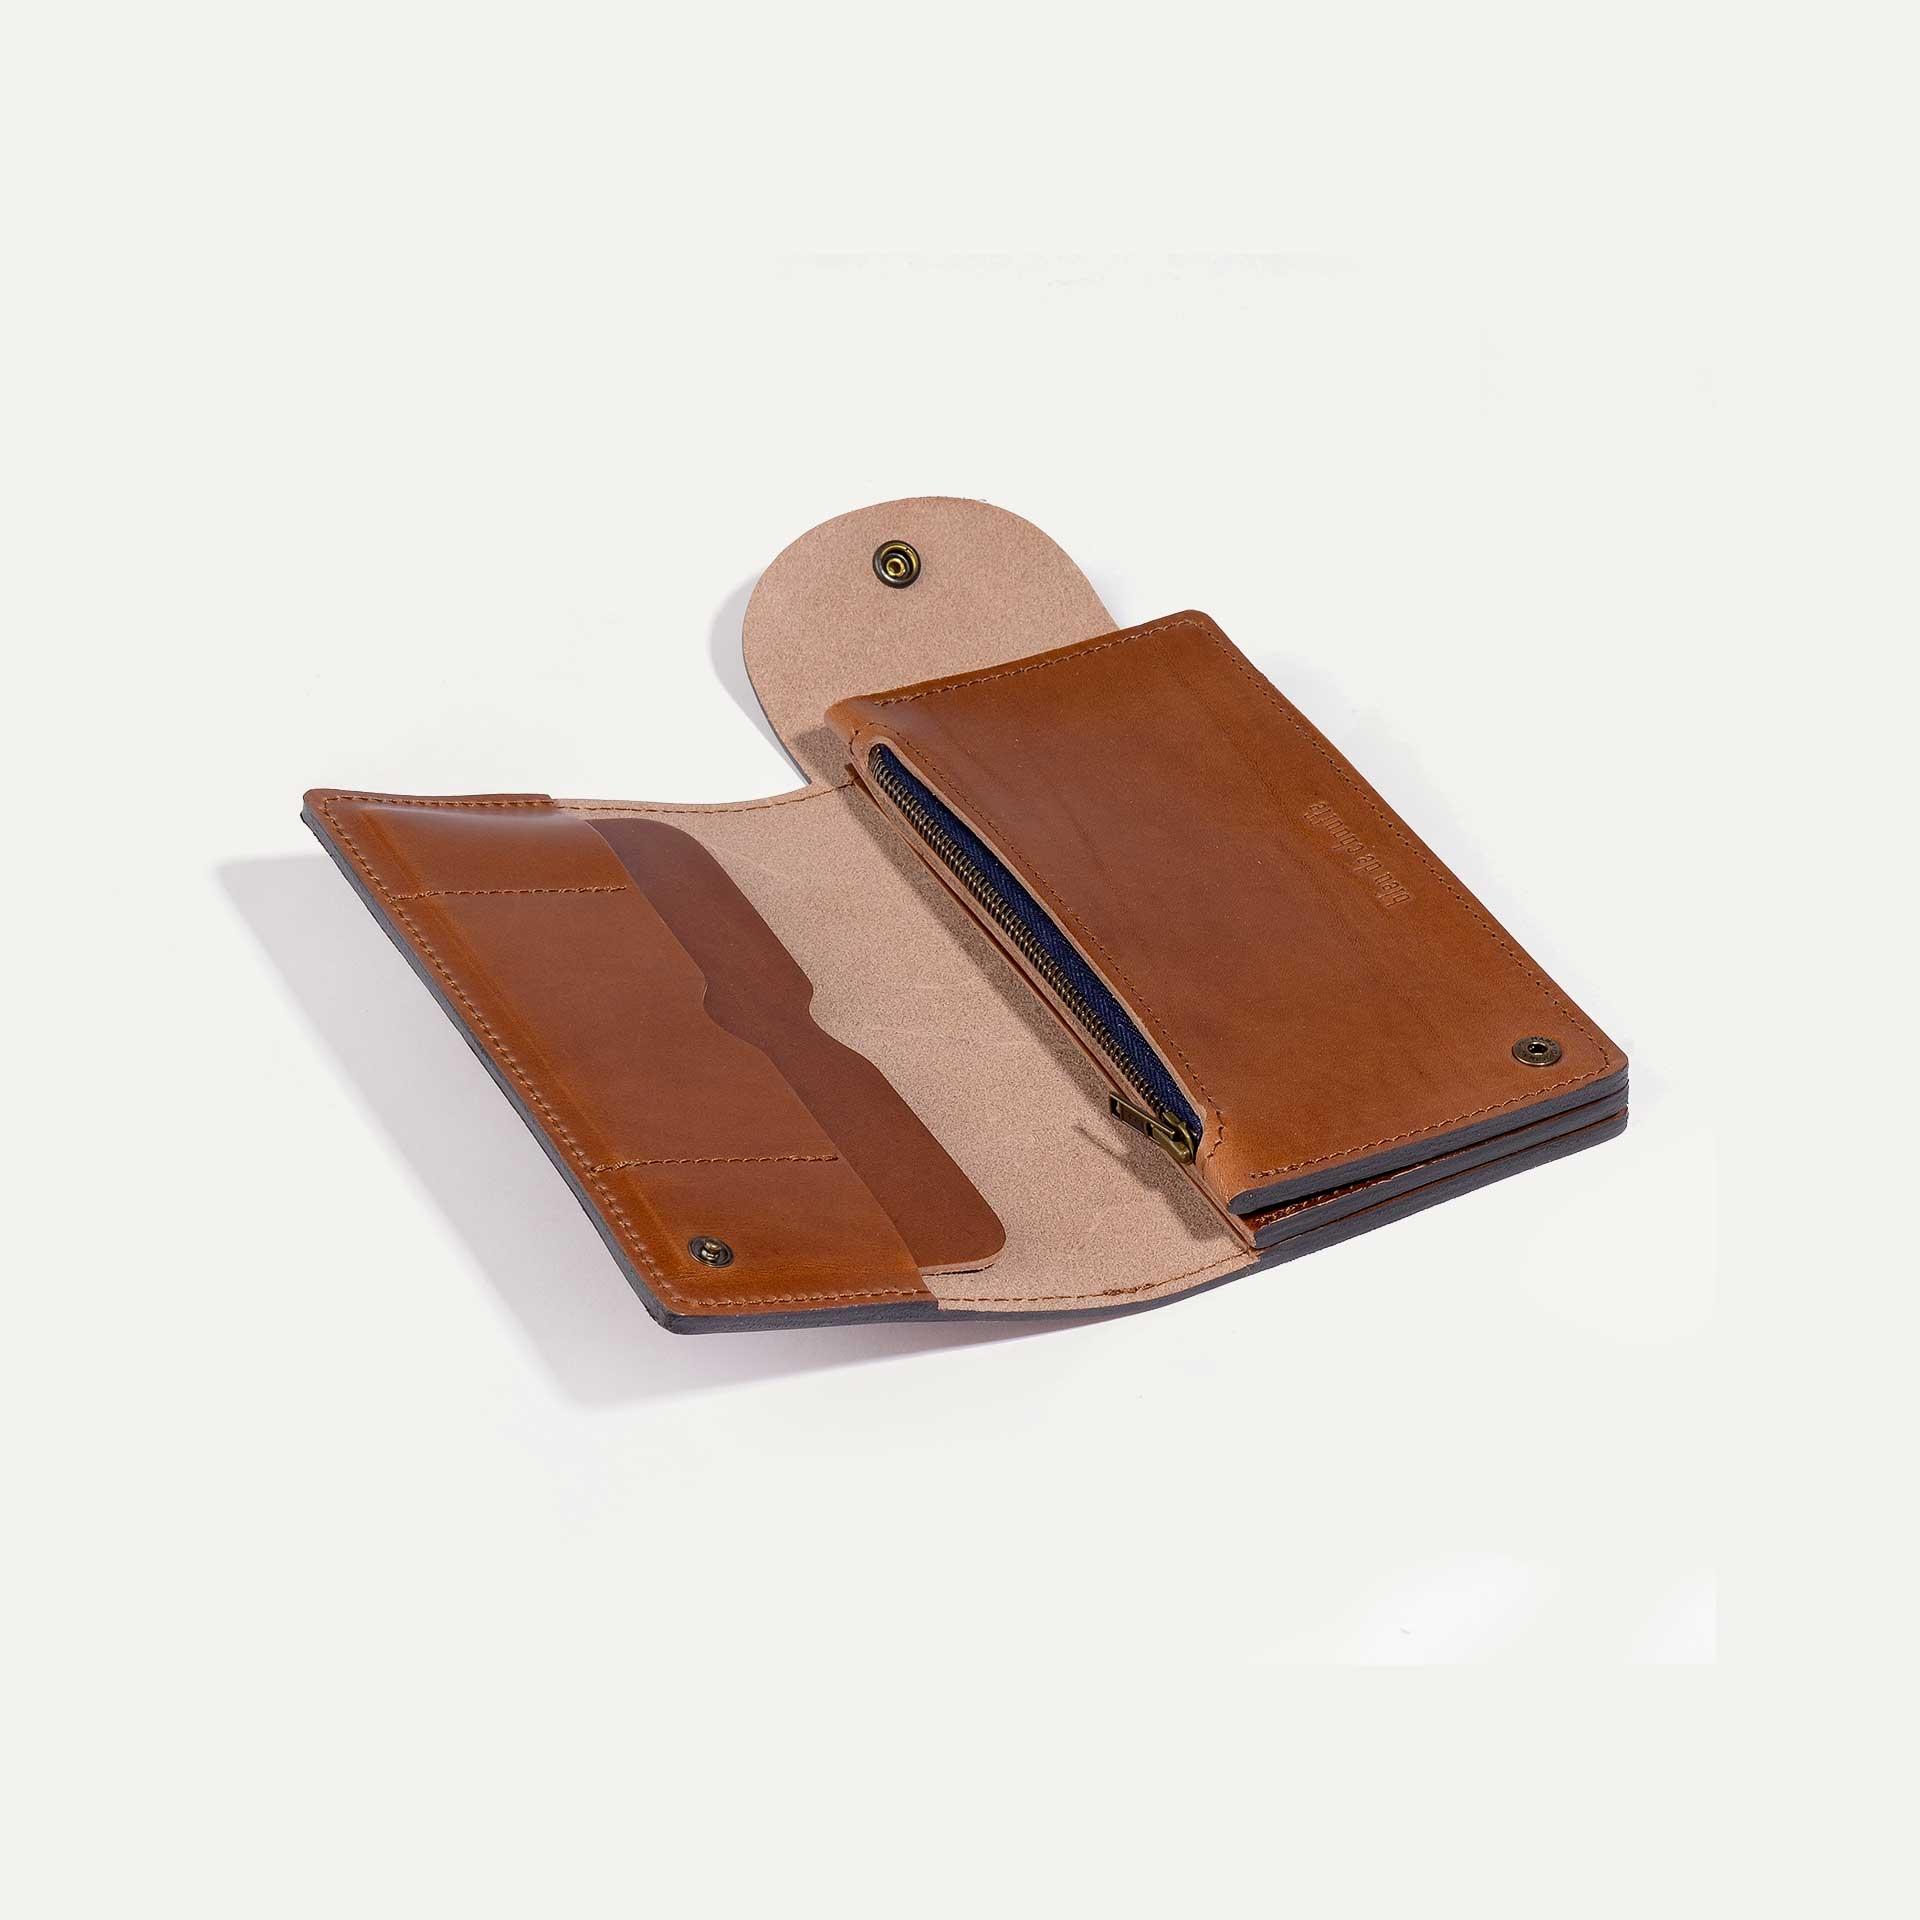 Corto wallet - Pain Brûlé (image n°4)